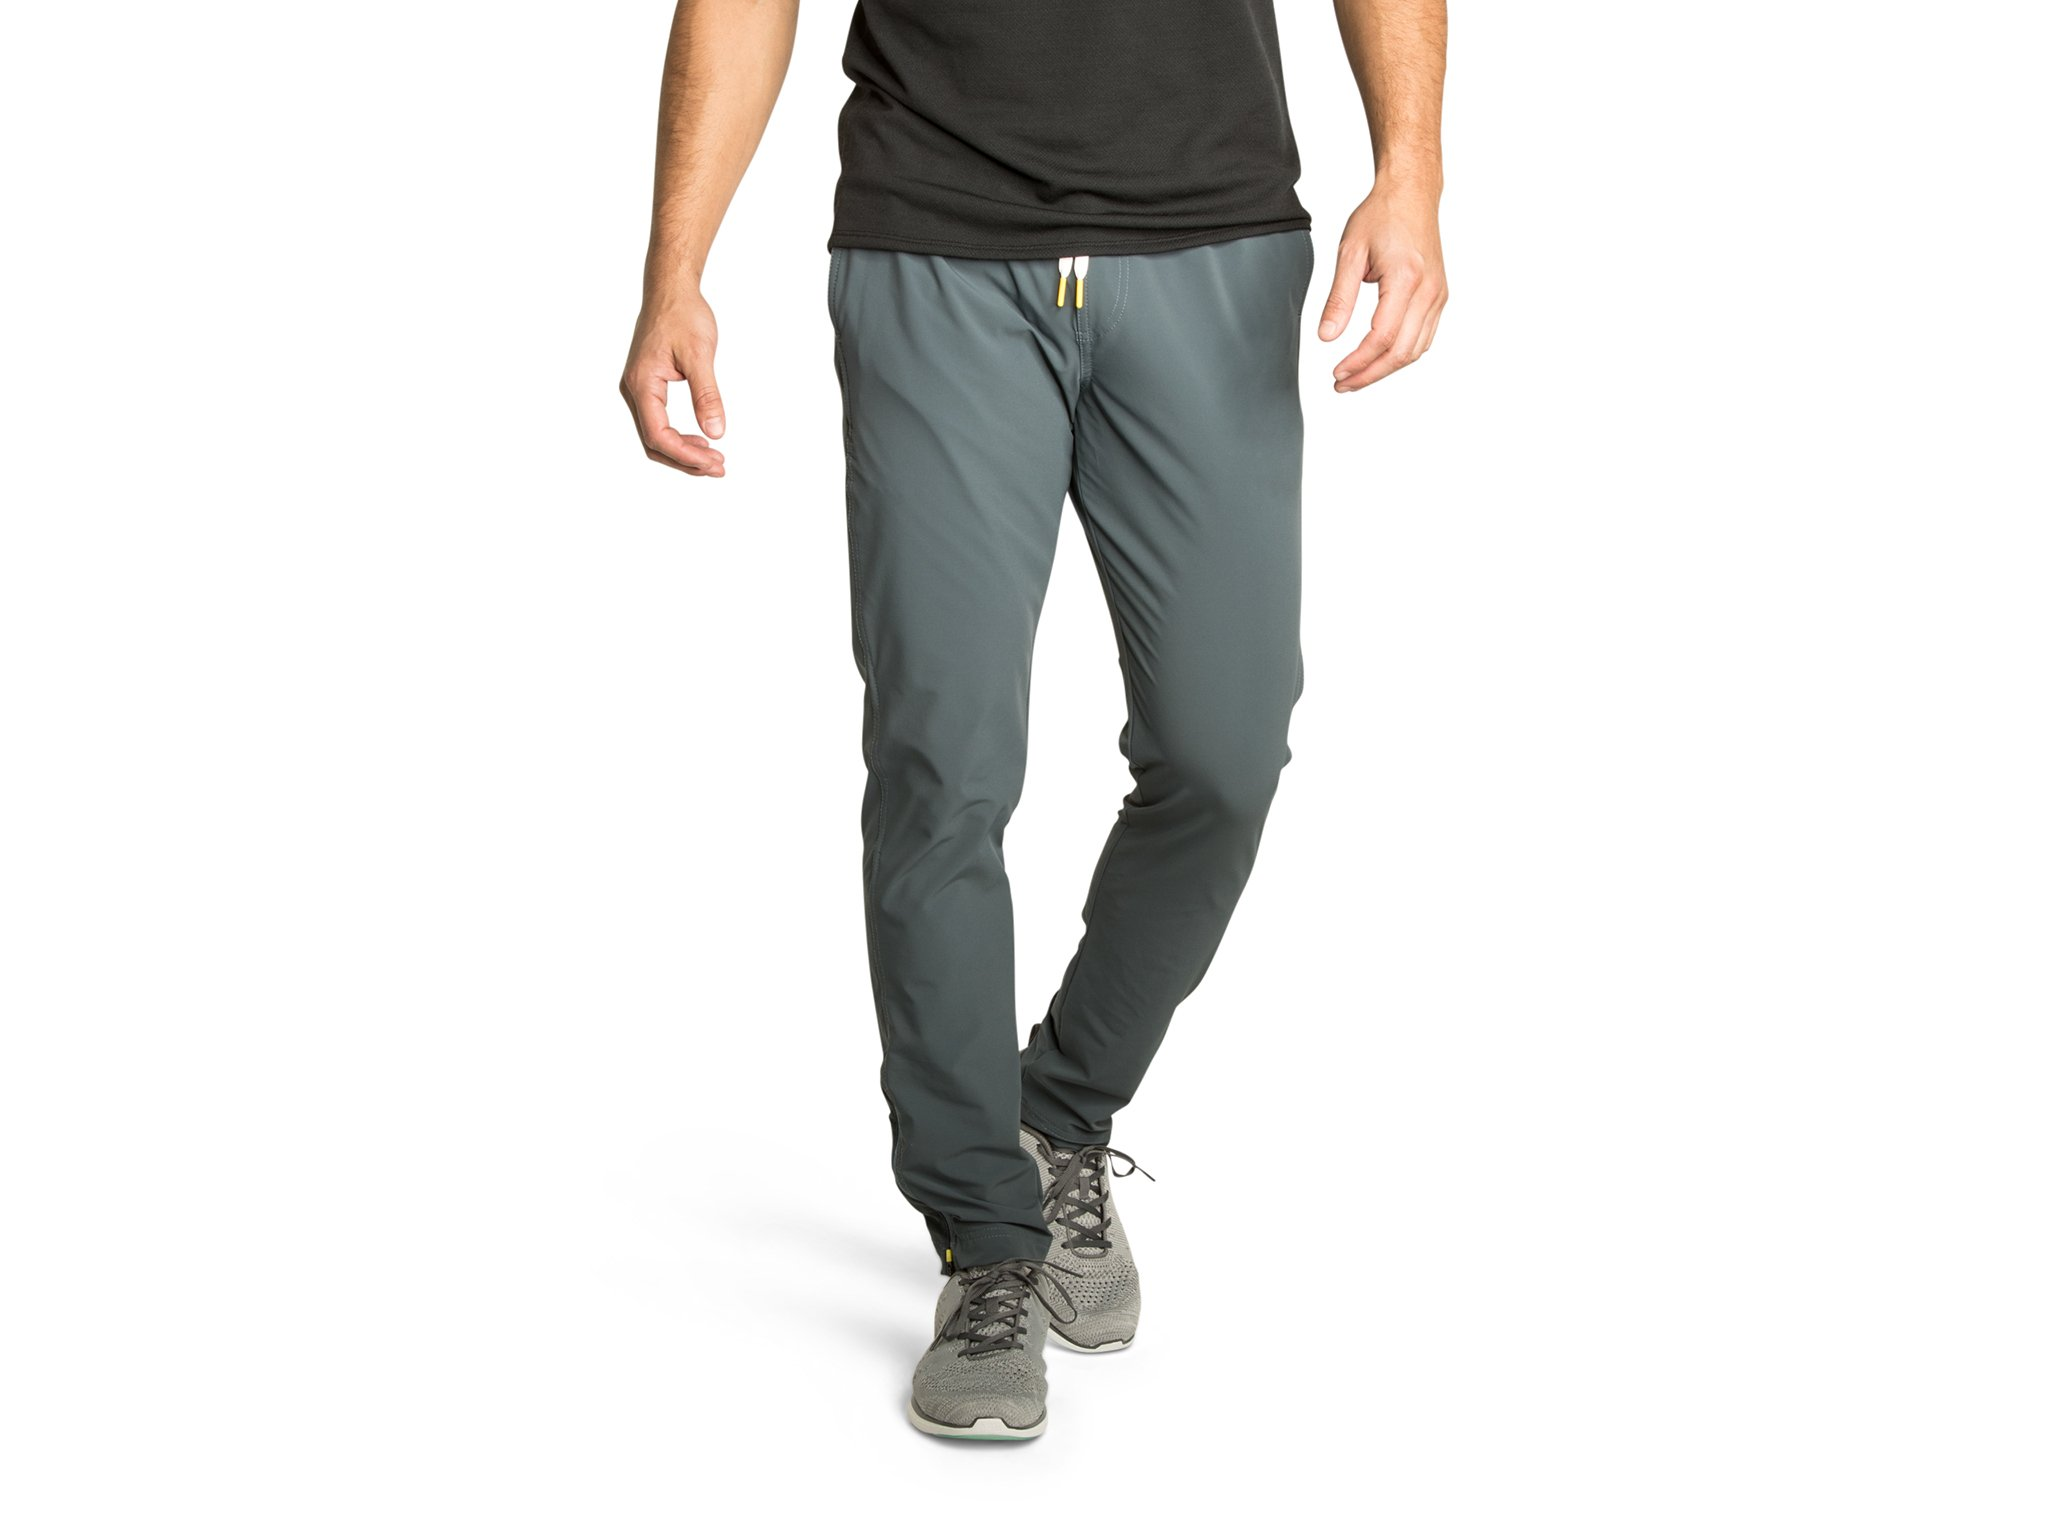 OLIVERS Apparel, Water Repellant, Athletic Cut, 4-Way Stretch, Bradbury Jogger Pants, 31 Inch Inseam - Cobalt - Medium